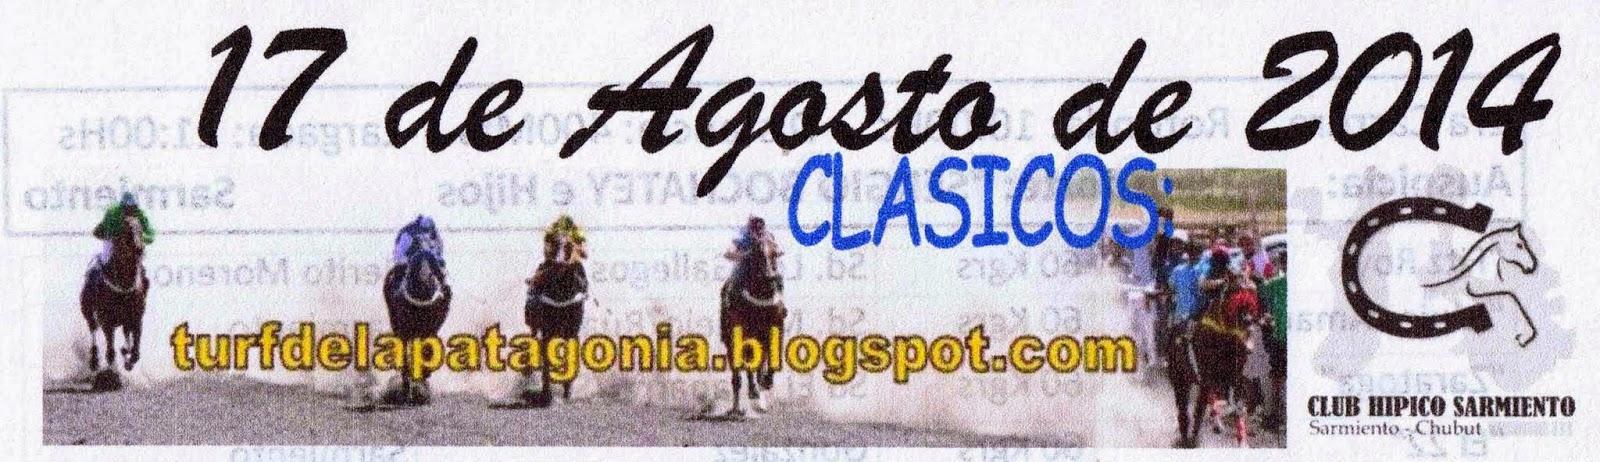 http://turfdelapatagonia.blogspot.com.ar/2014/08/1708-programa-de-carreras-de-caballos.html